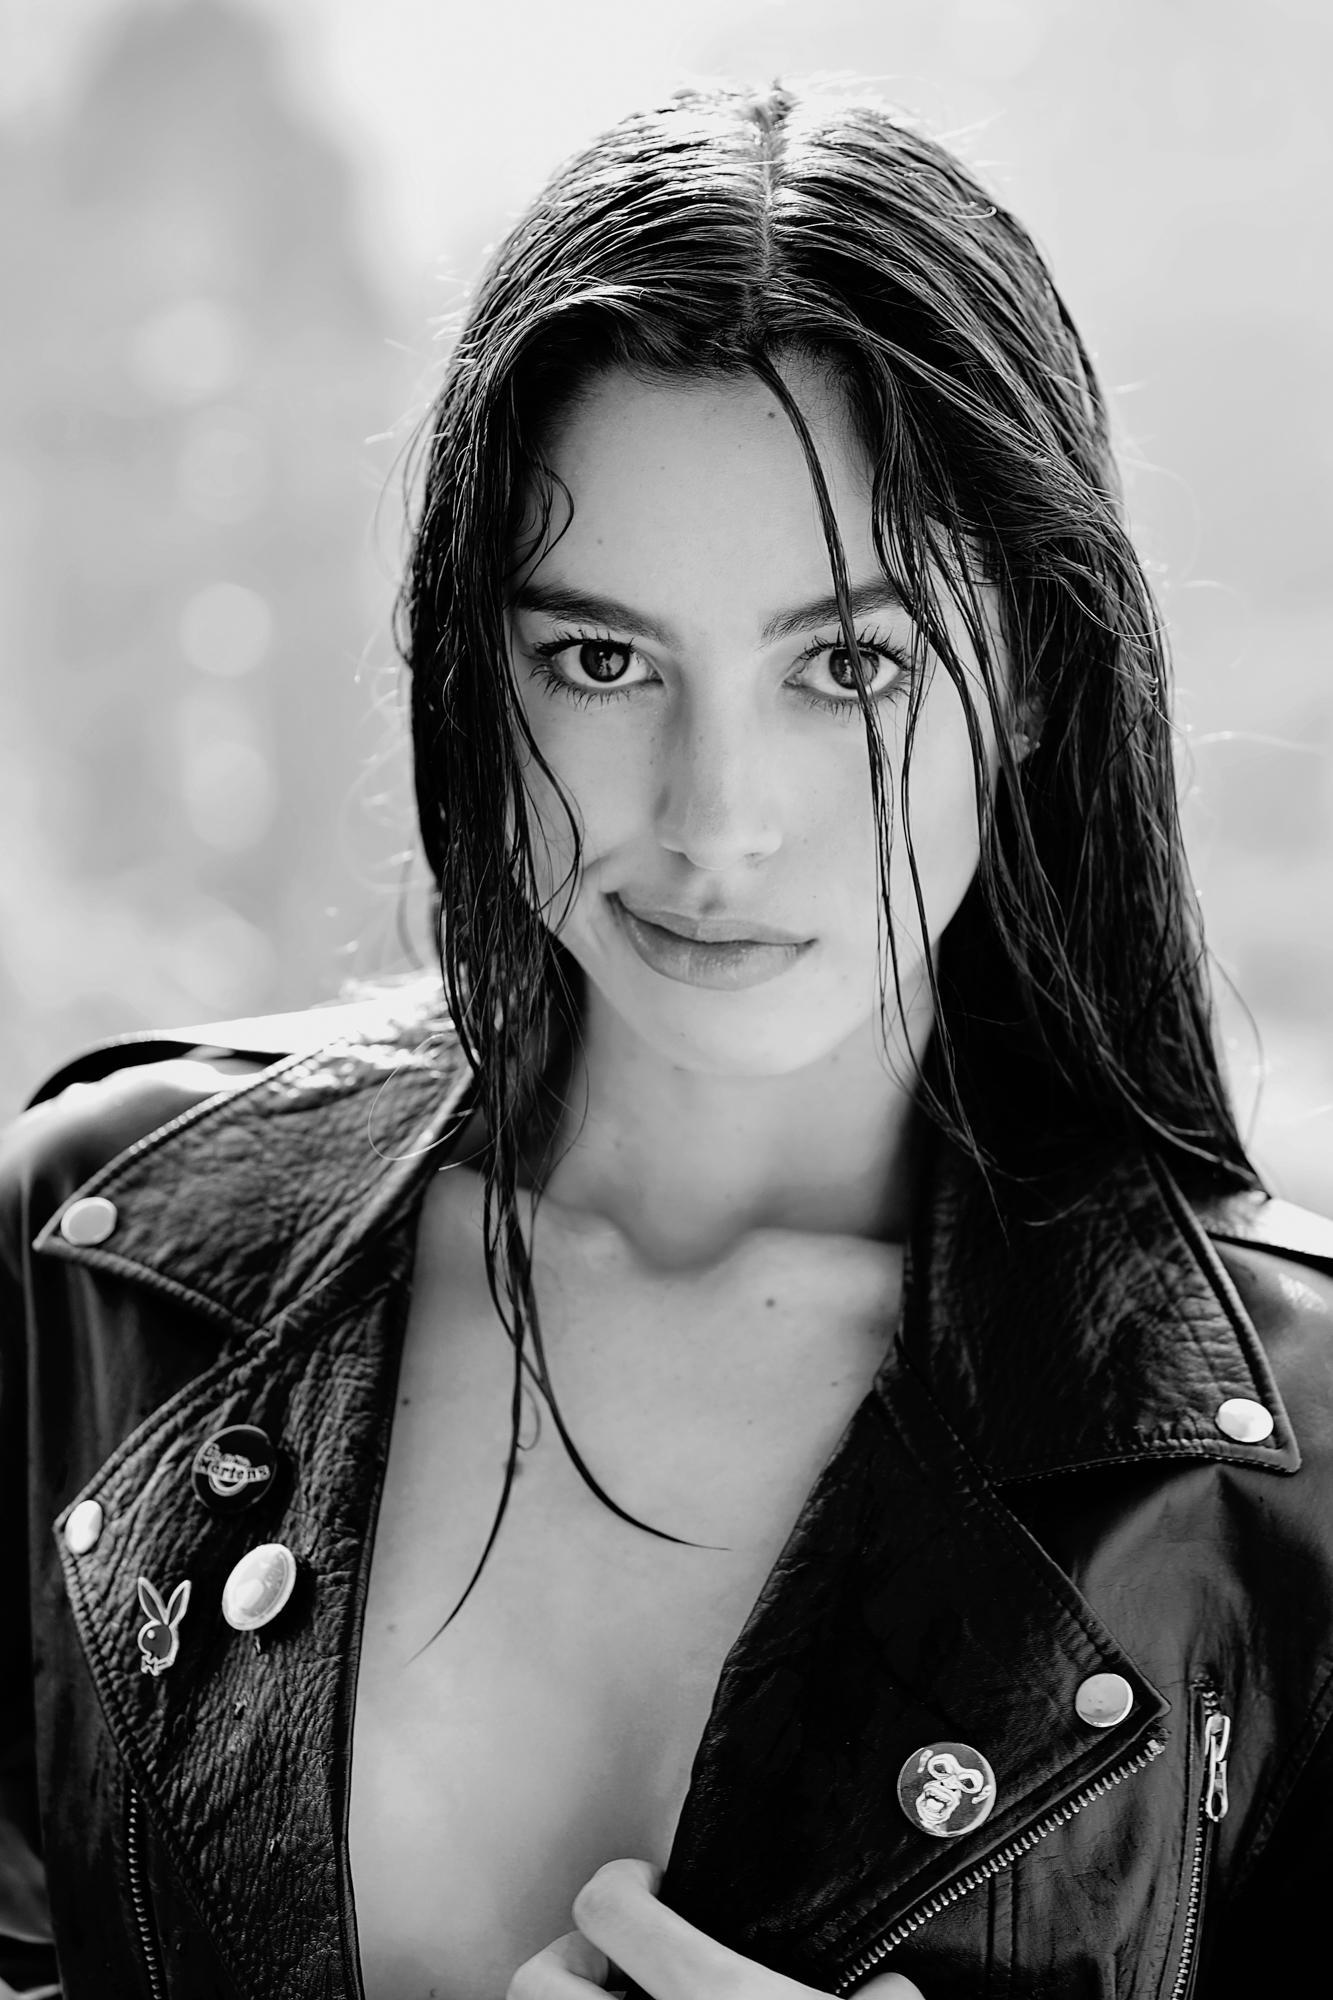 Erica Giraldo